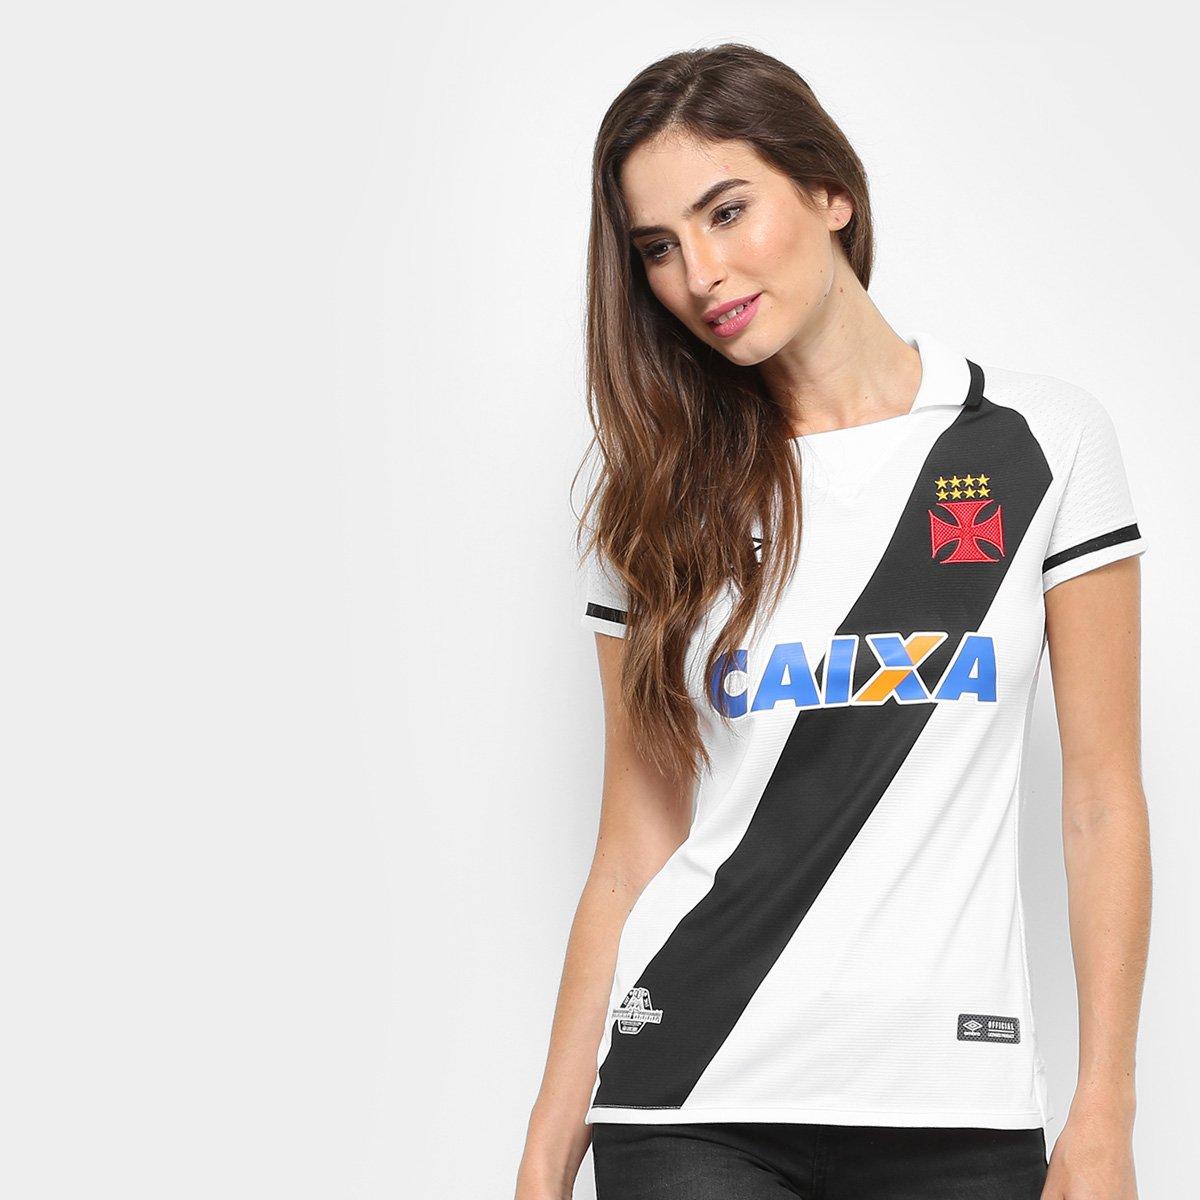 037e7a021a552 Camisa Vasco II s n° 17 18 Torcedor Umbro Feminina - Compre Agora ...